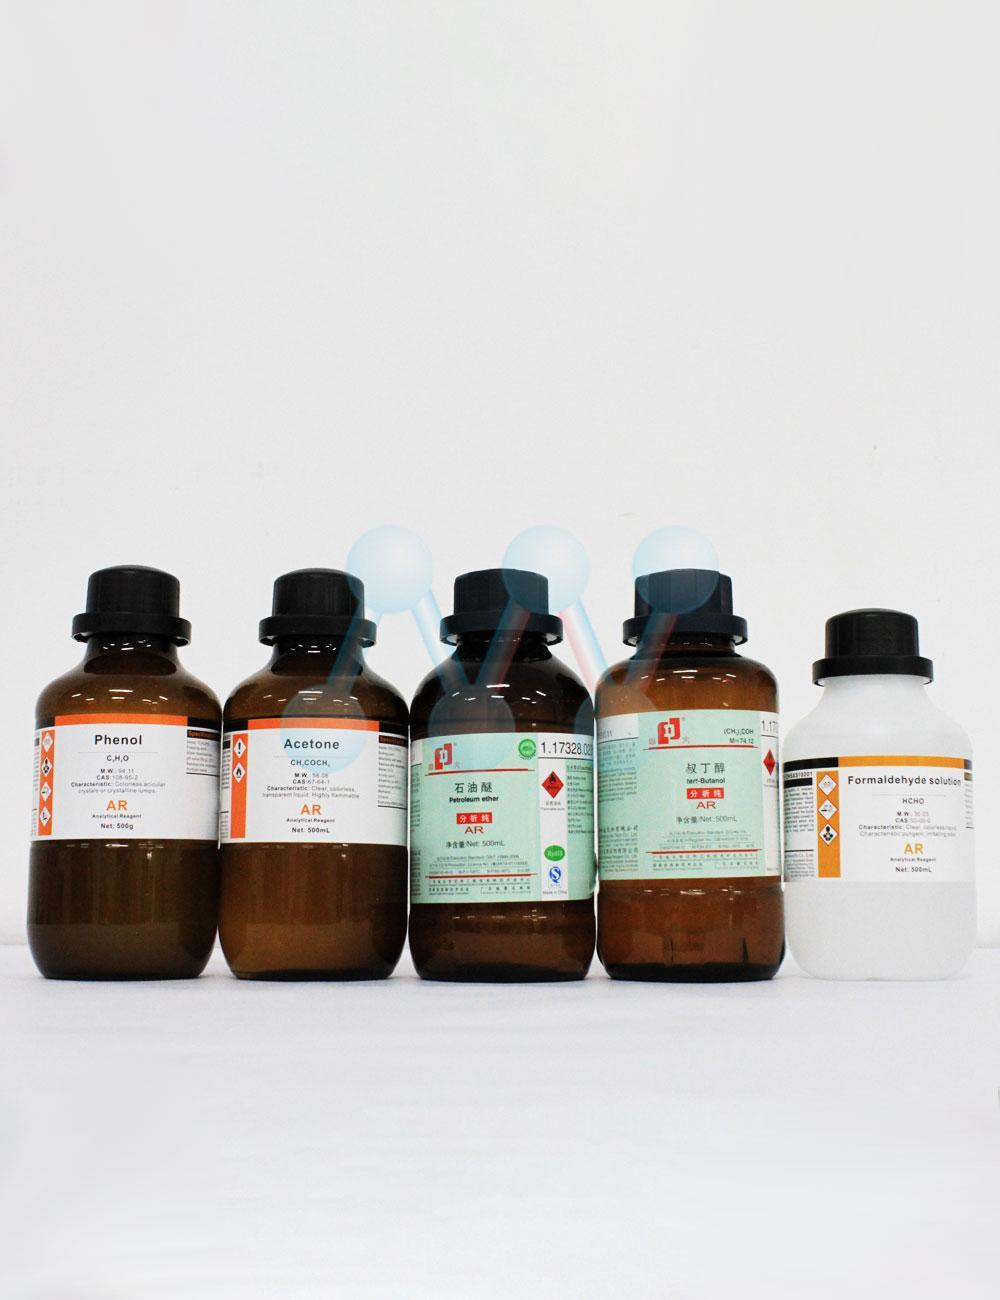 Ethylene Glycol C2H6O2